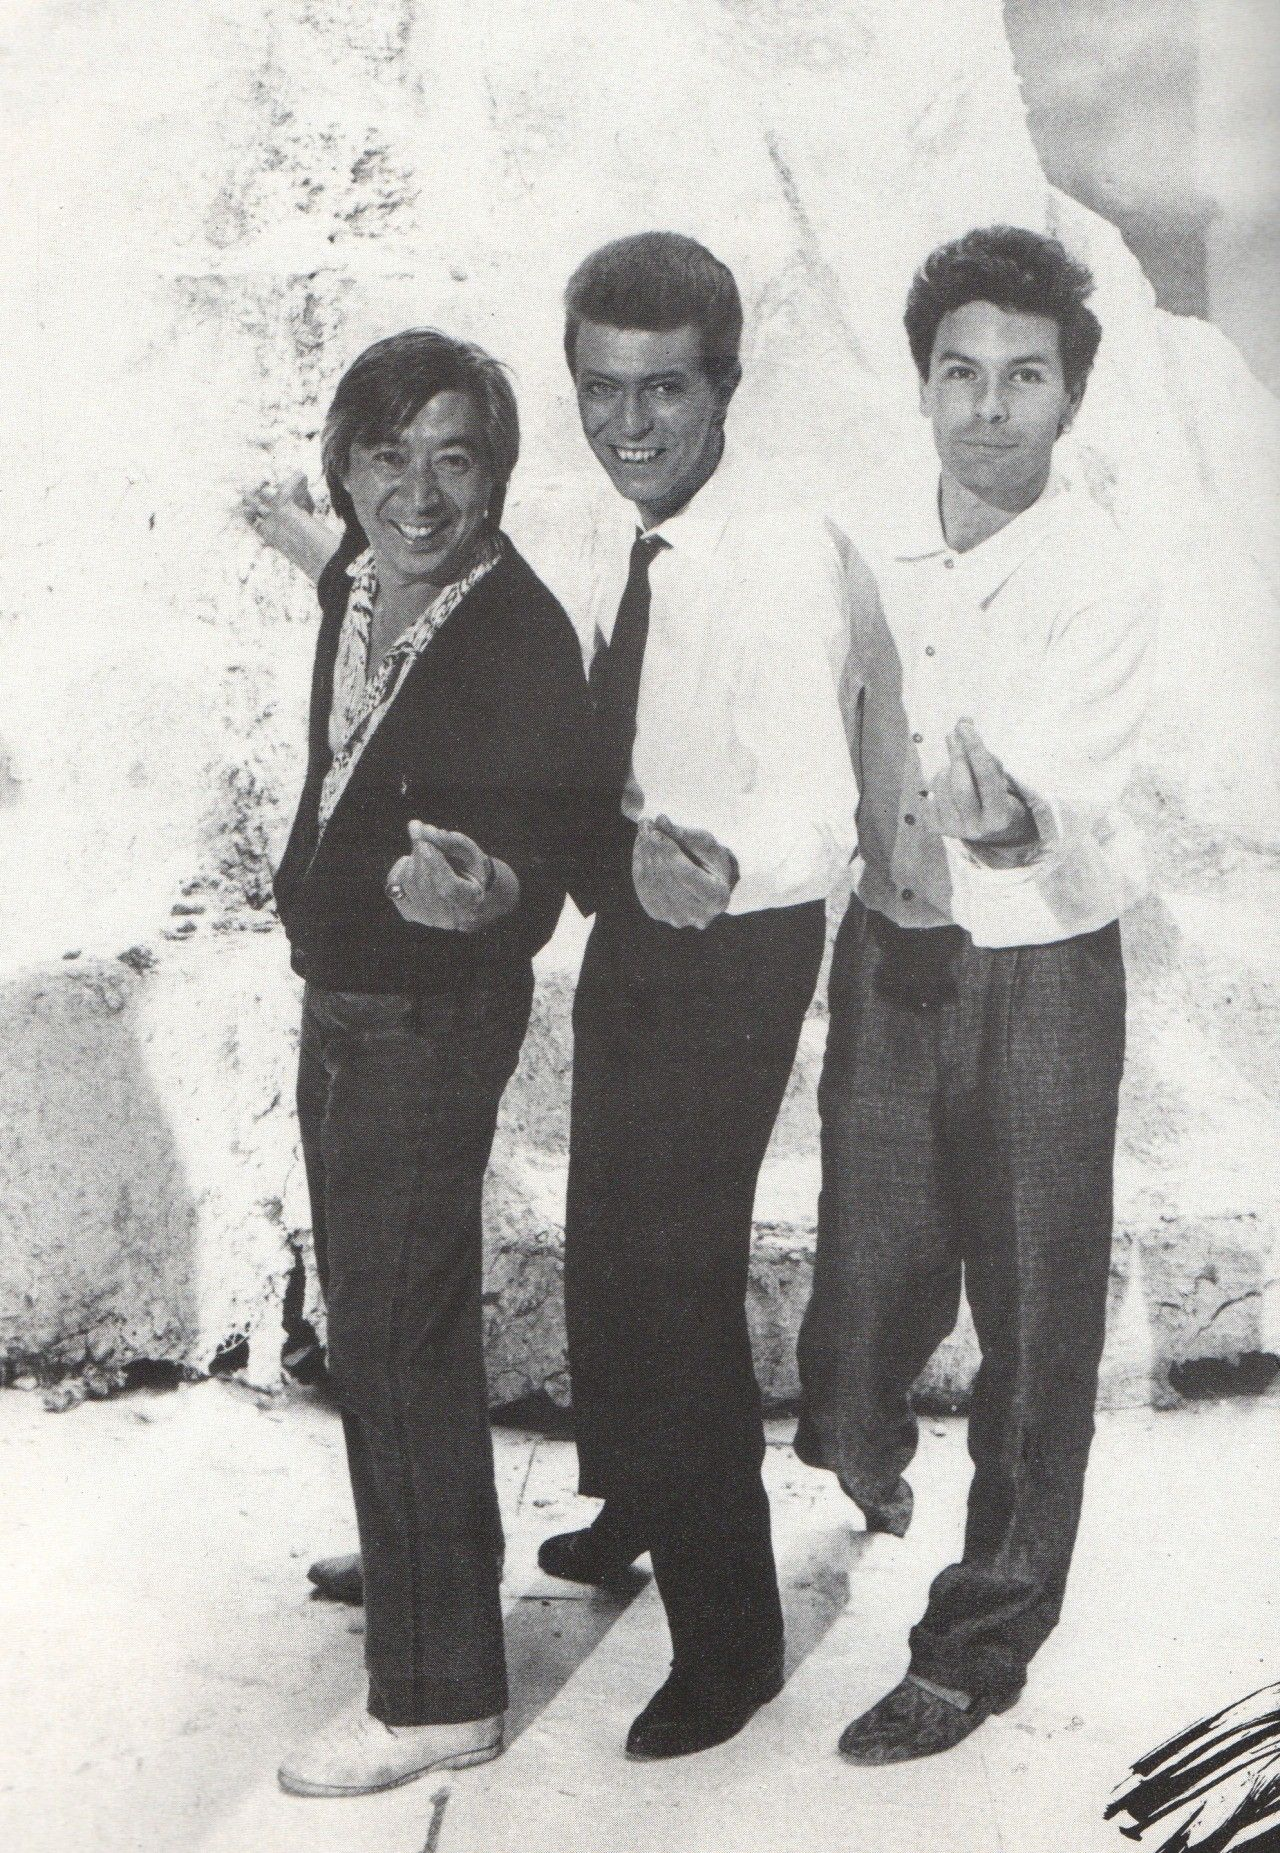 David Toguri, David Bowie & Julien Temple on the set of Absolute Beginners, 1986 | David bowie born, David bowie, Bowie